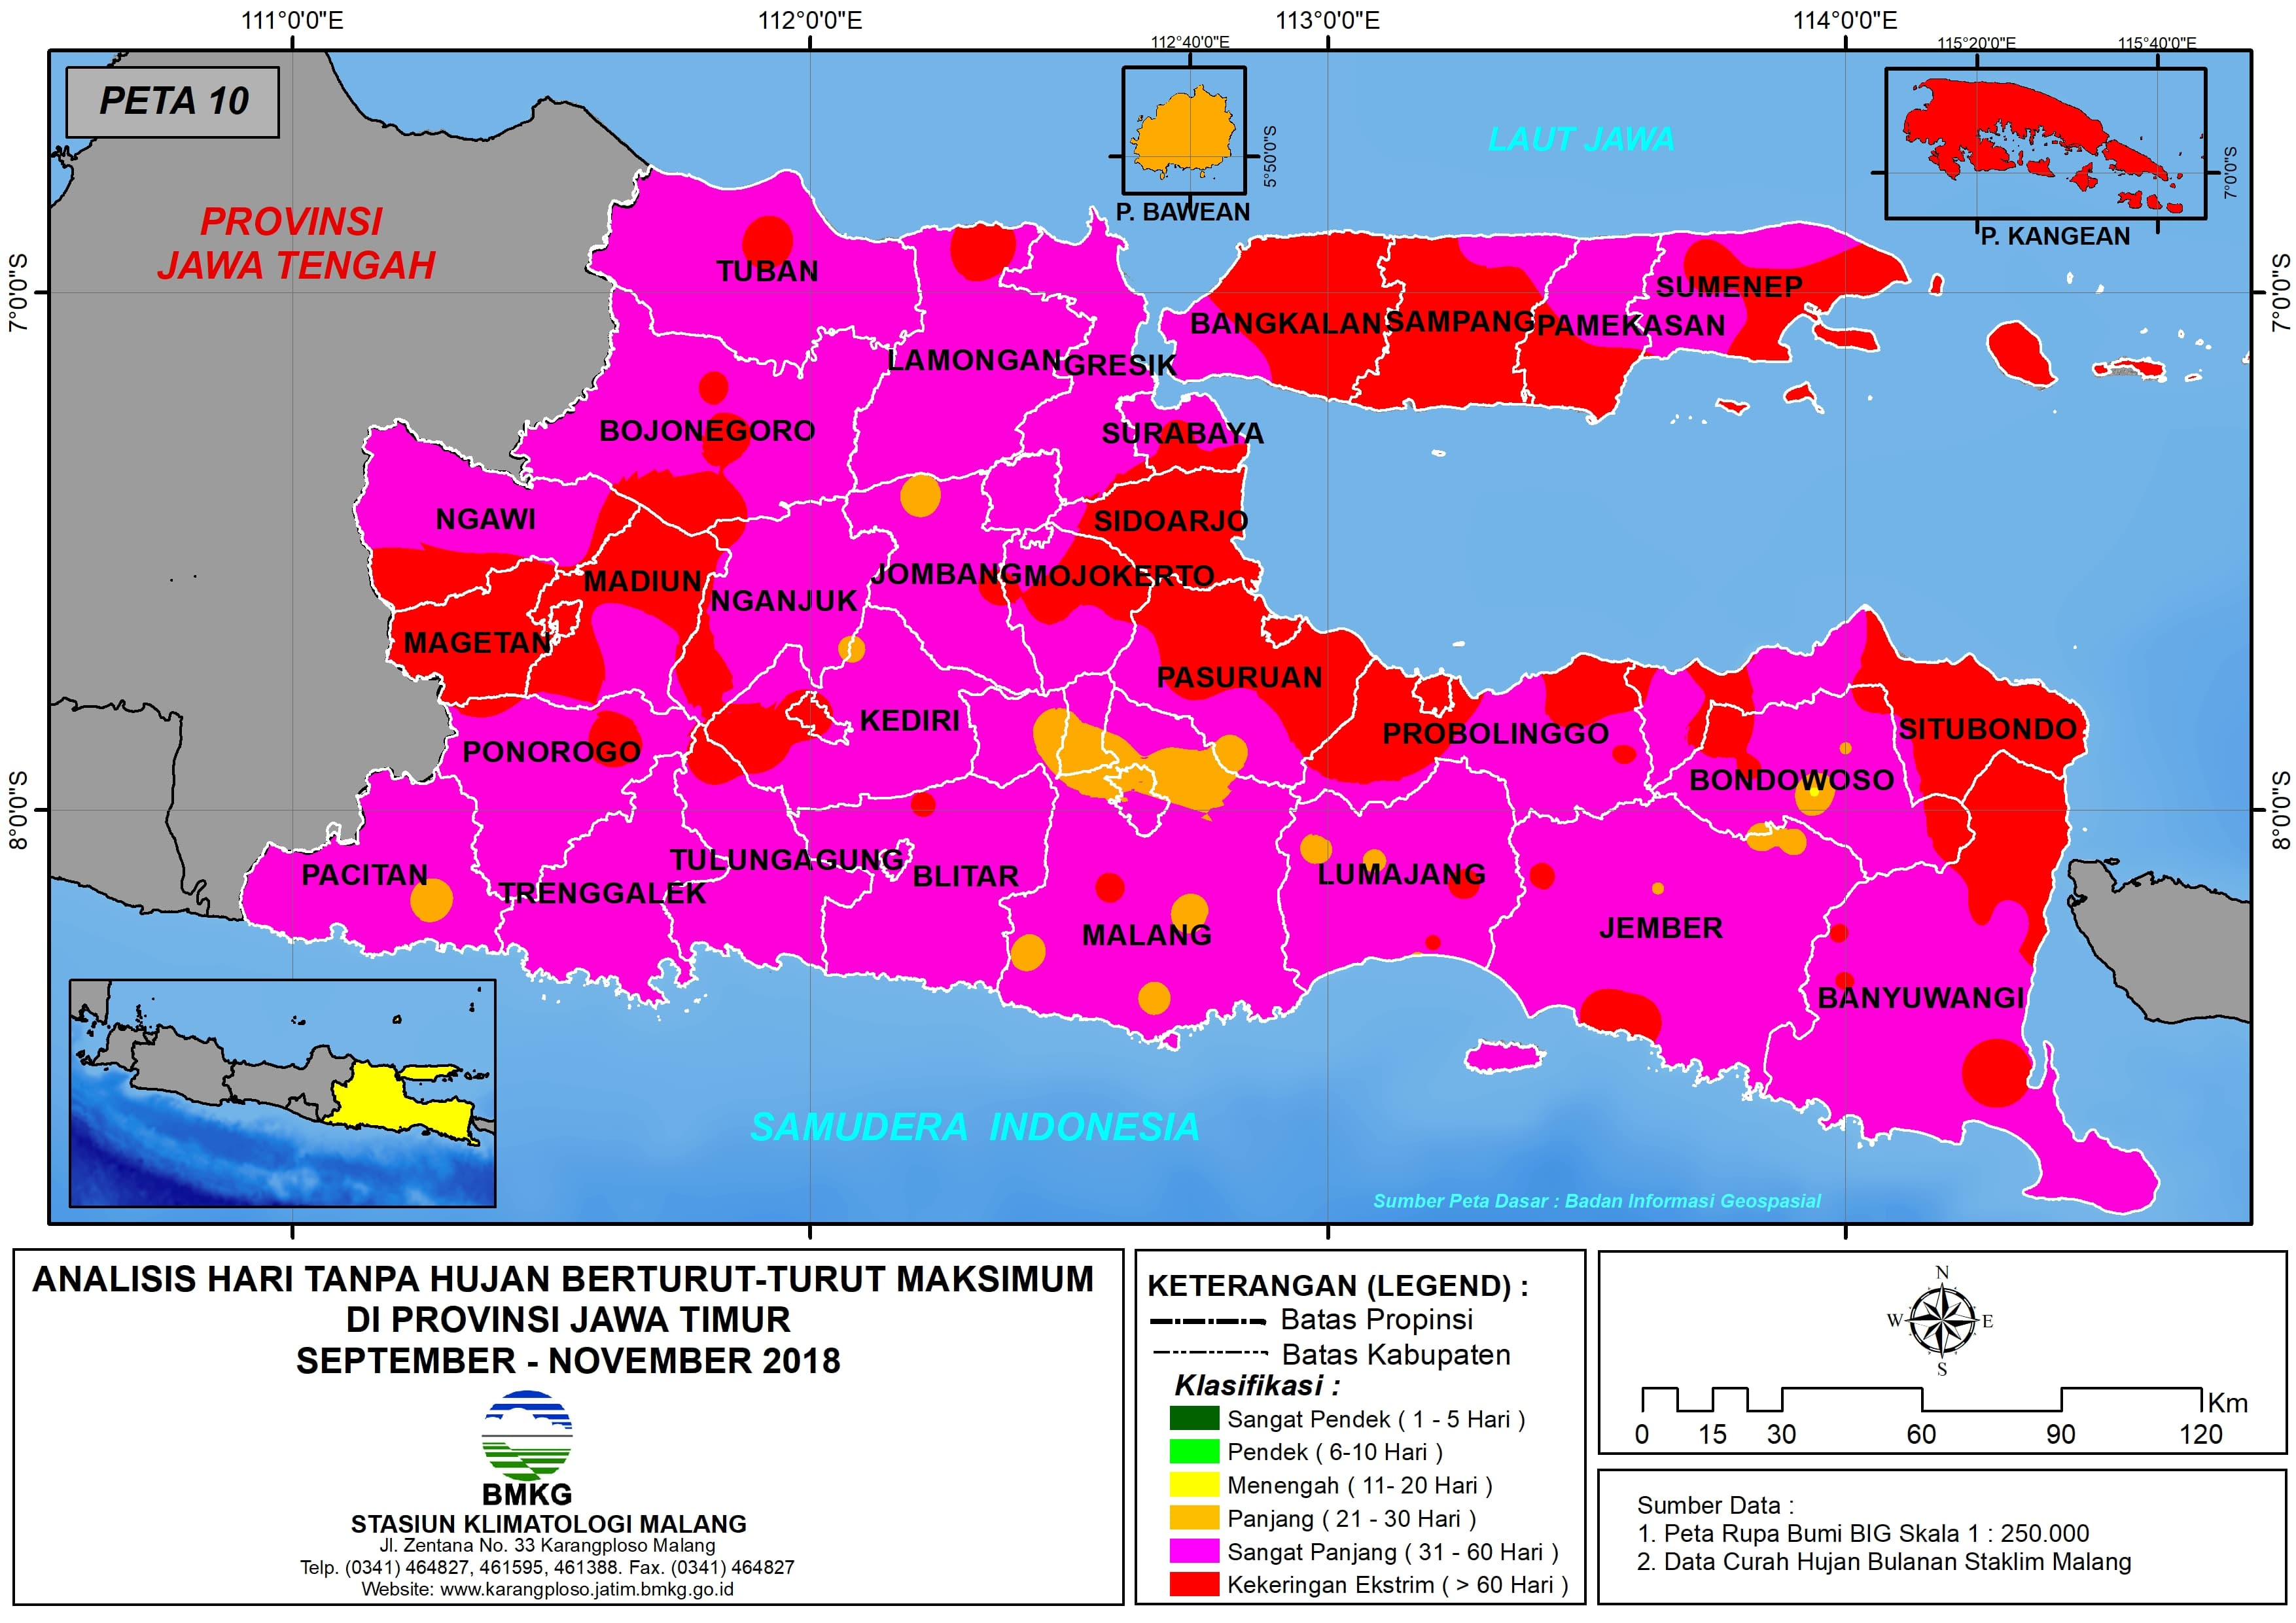 Analisis Indeks Presipitasi Terstandarisasi SPI 3 Bulanan Untuk Bulan September Oktober Nopember Tahun 2018 di Provinsi Jawa Timur